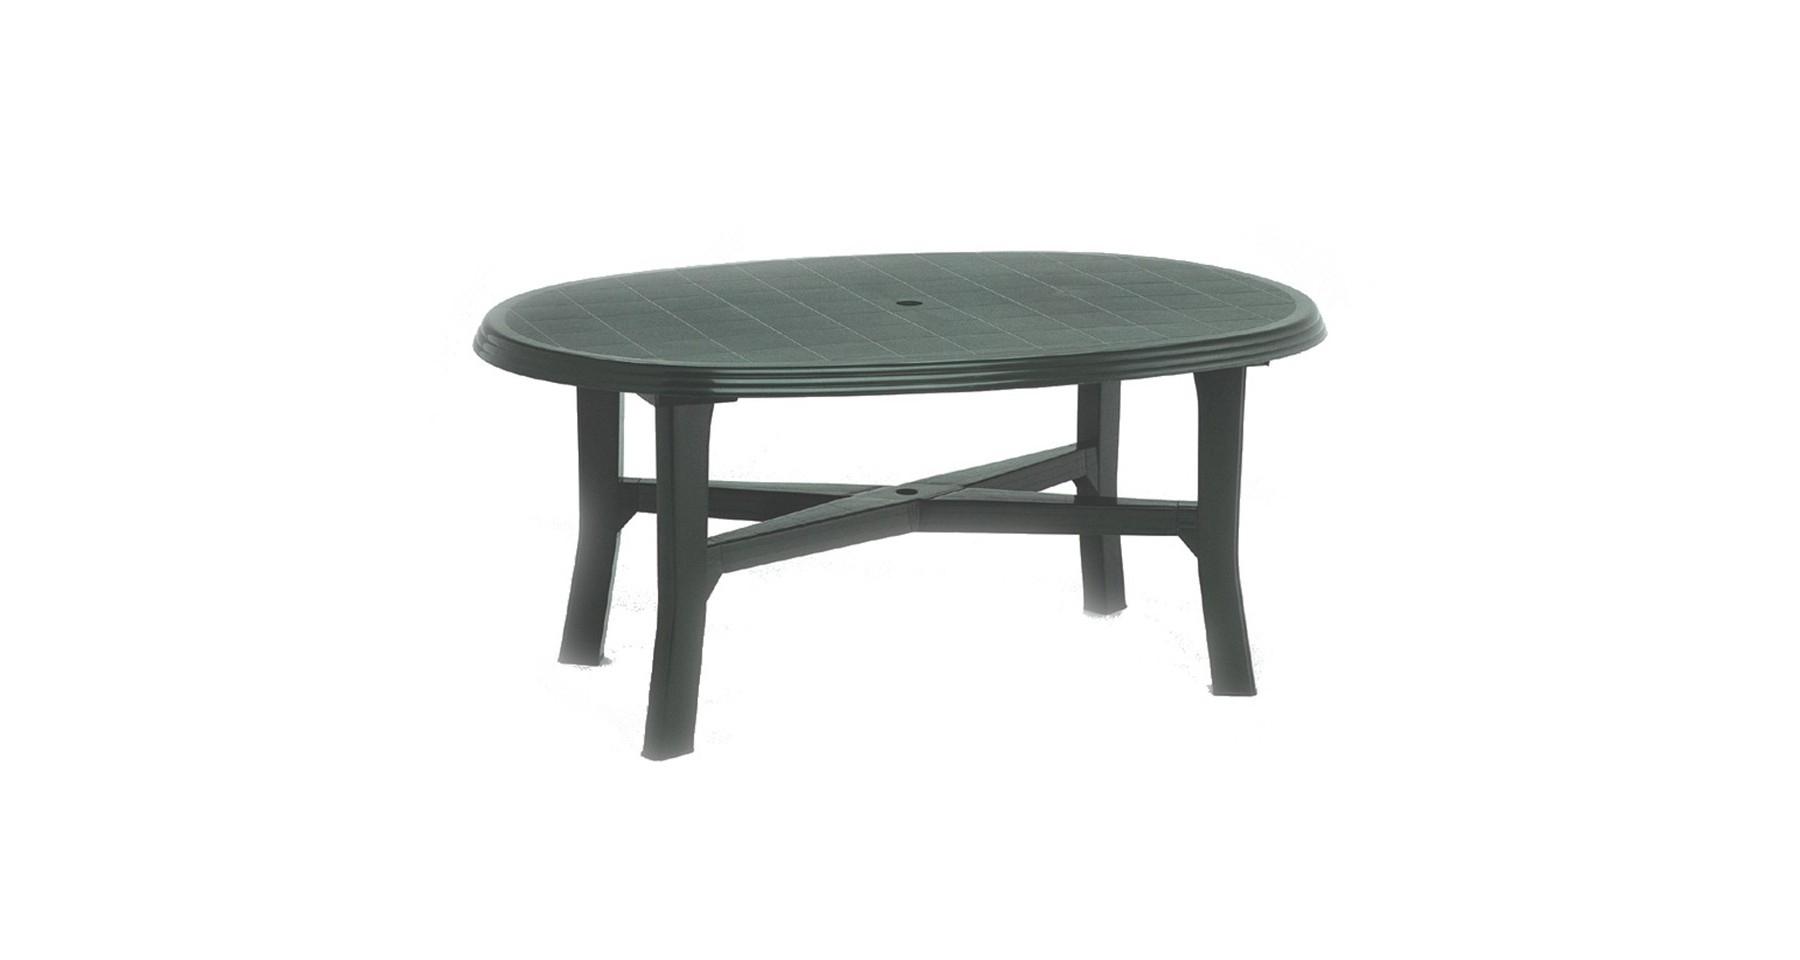 Table De Jardin Verte Ovale En Polyproplyène 6 Personnes Load intérieur Table Jardin Verte